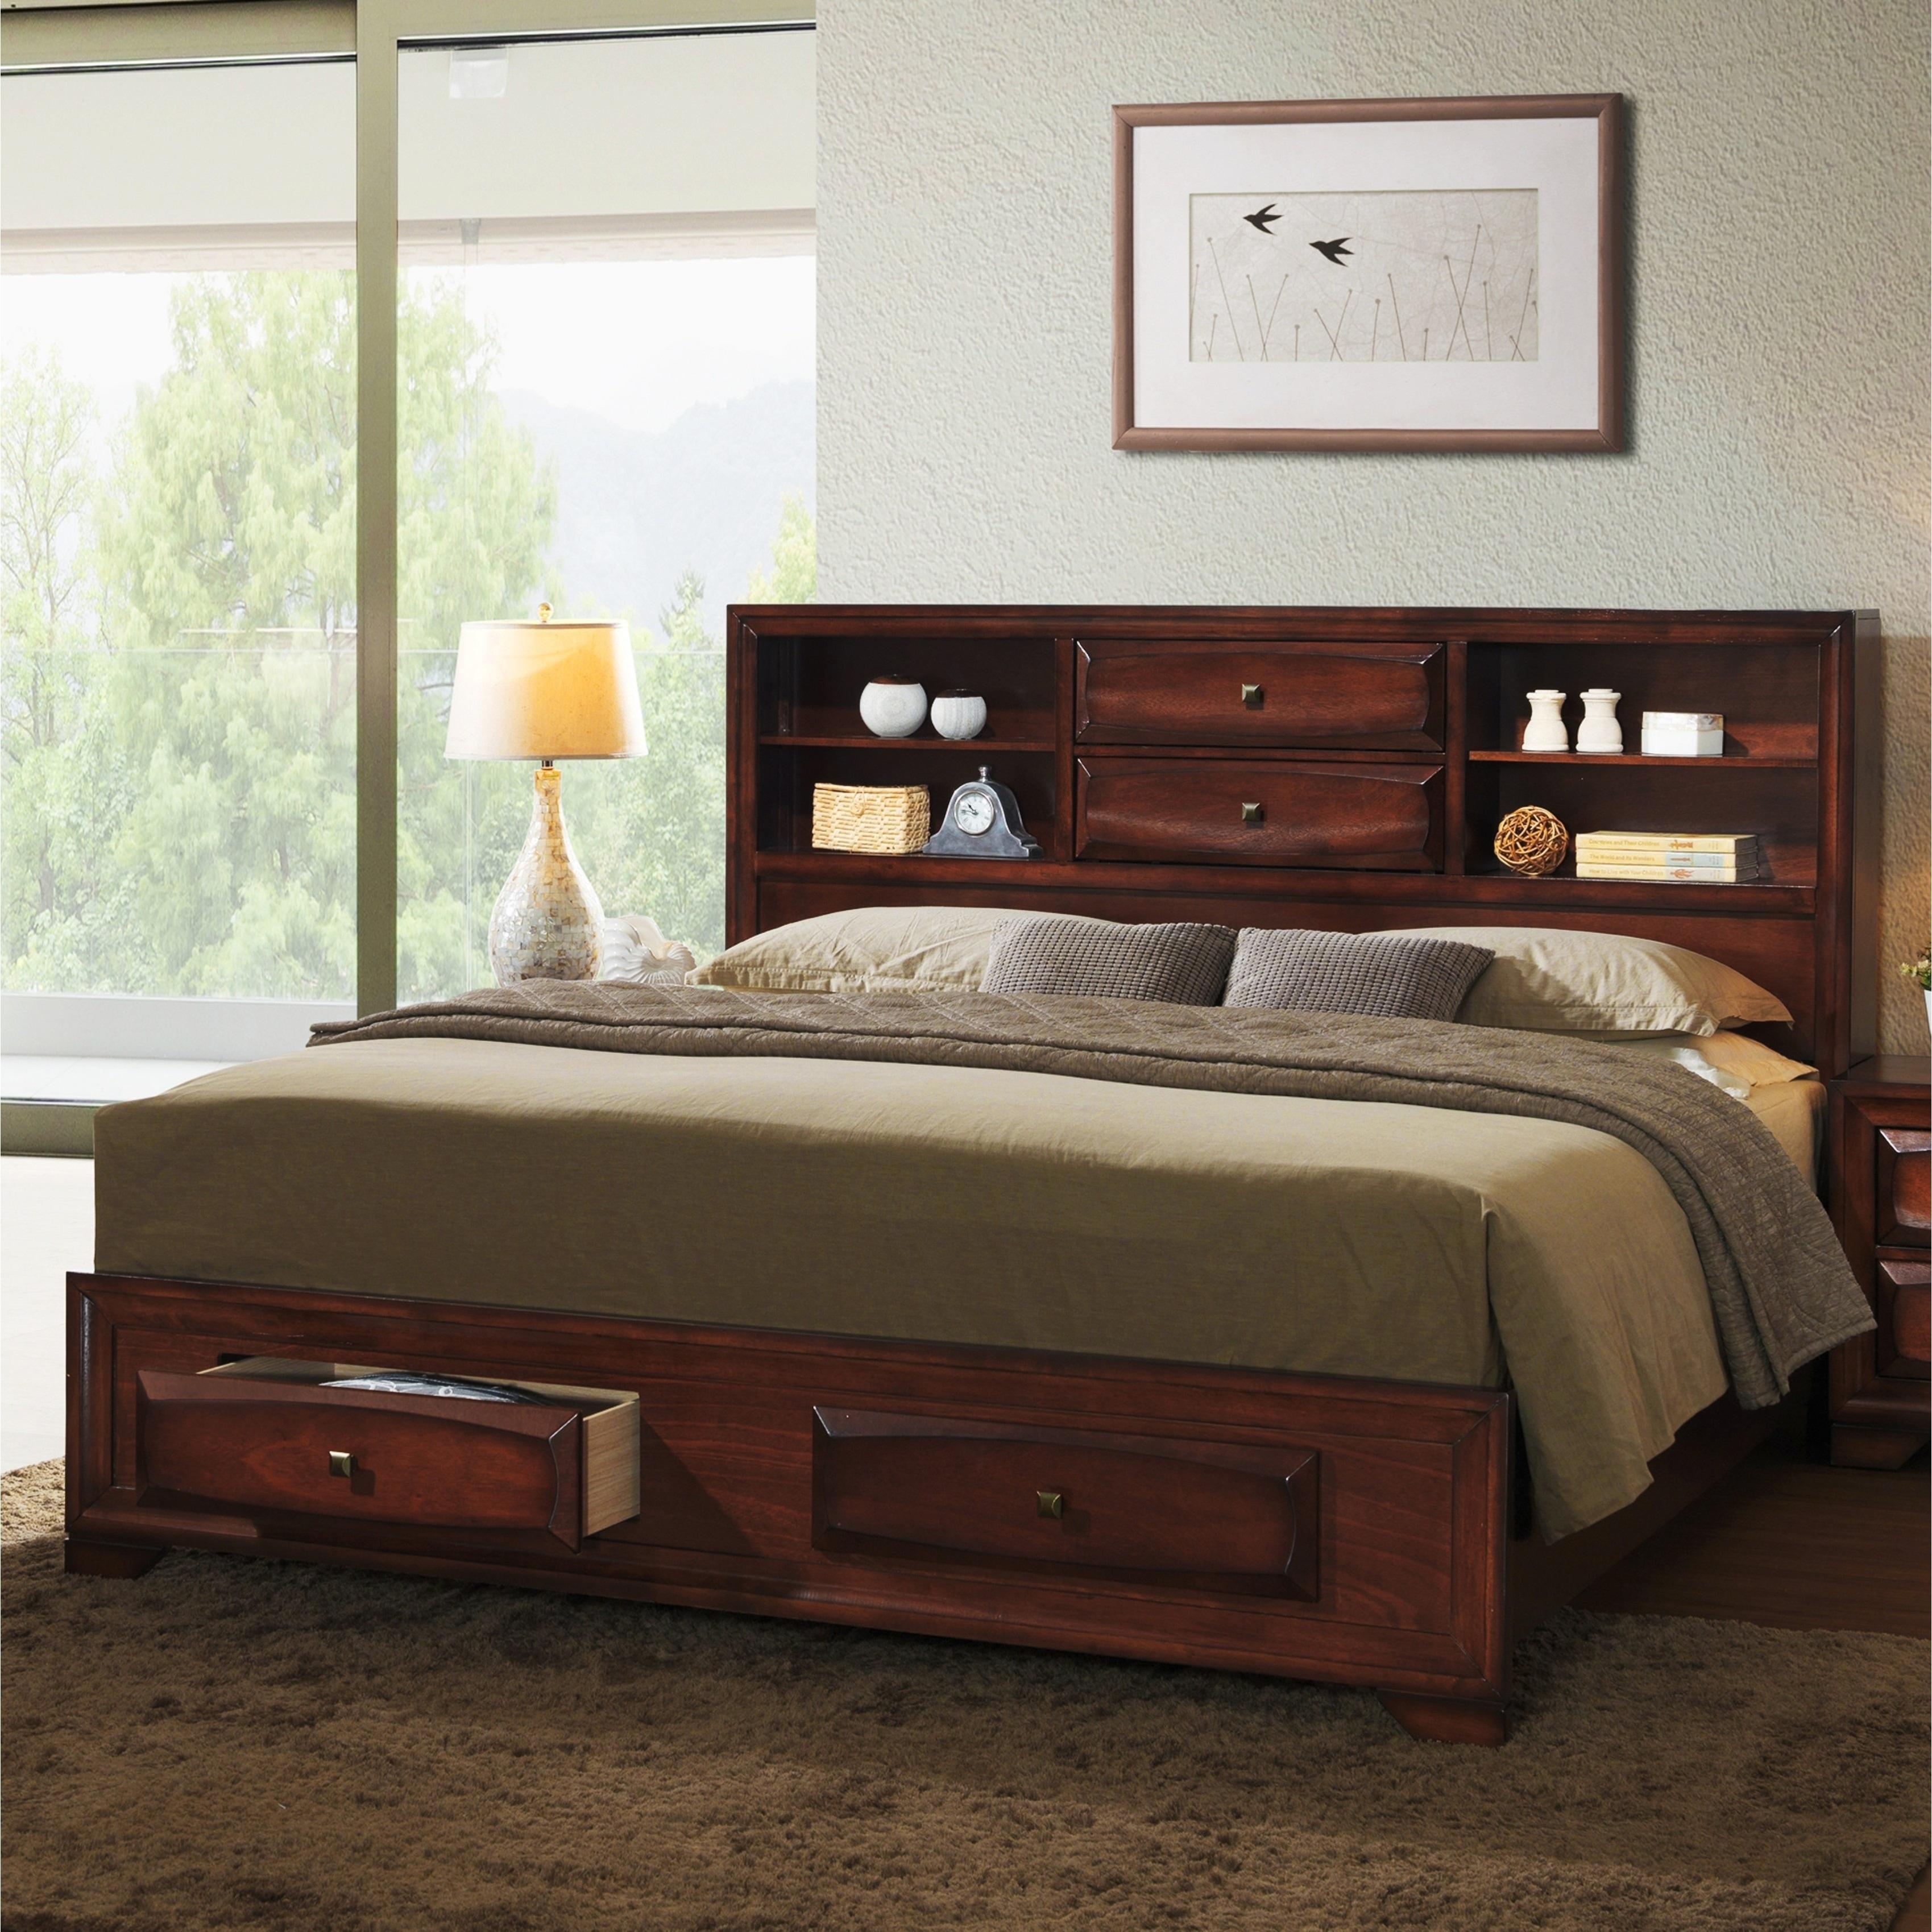 Shop Asger Antique Oak Wood Queen Size Storage Platform Bed